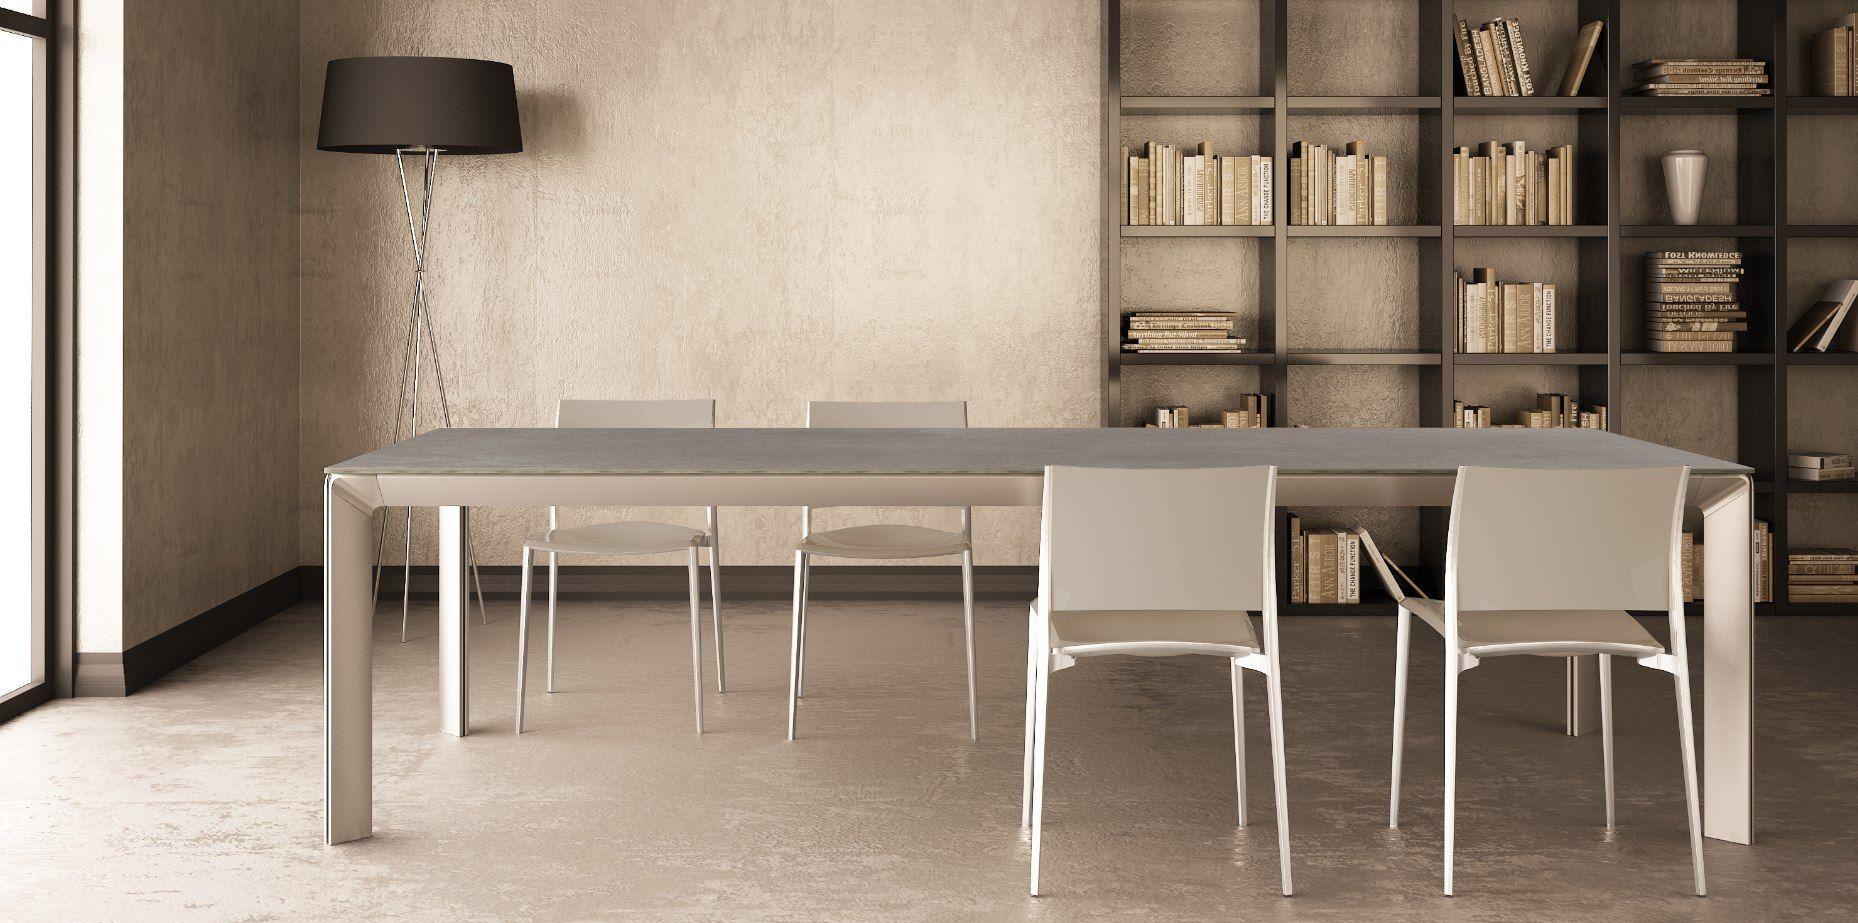 Table Class @ Top Interieur | Eetkamers, kasten, (salon)tafels en ...